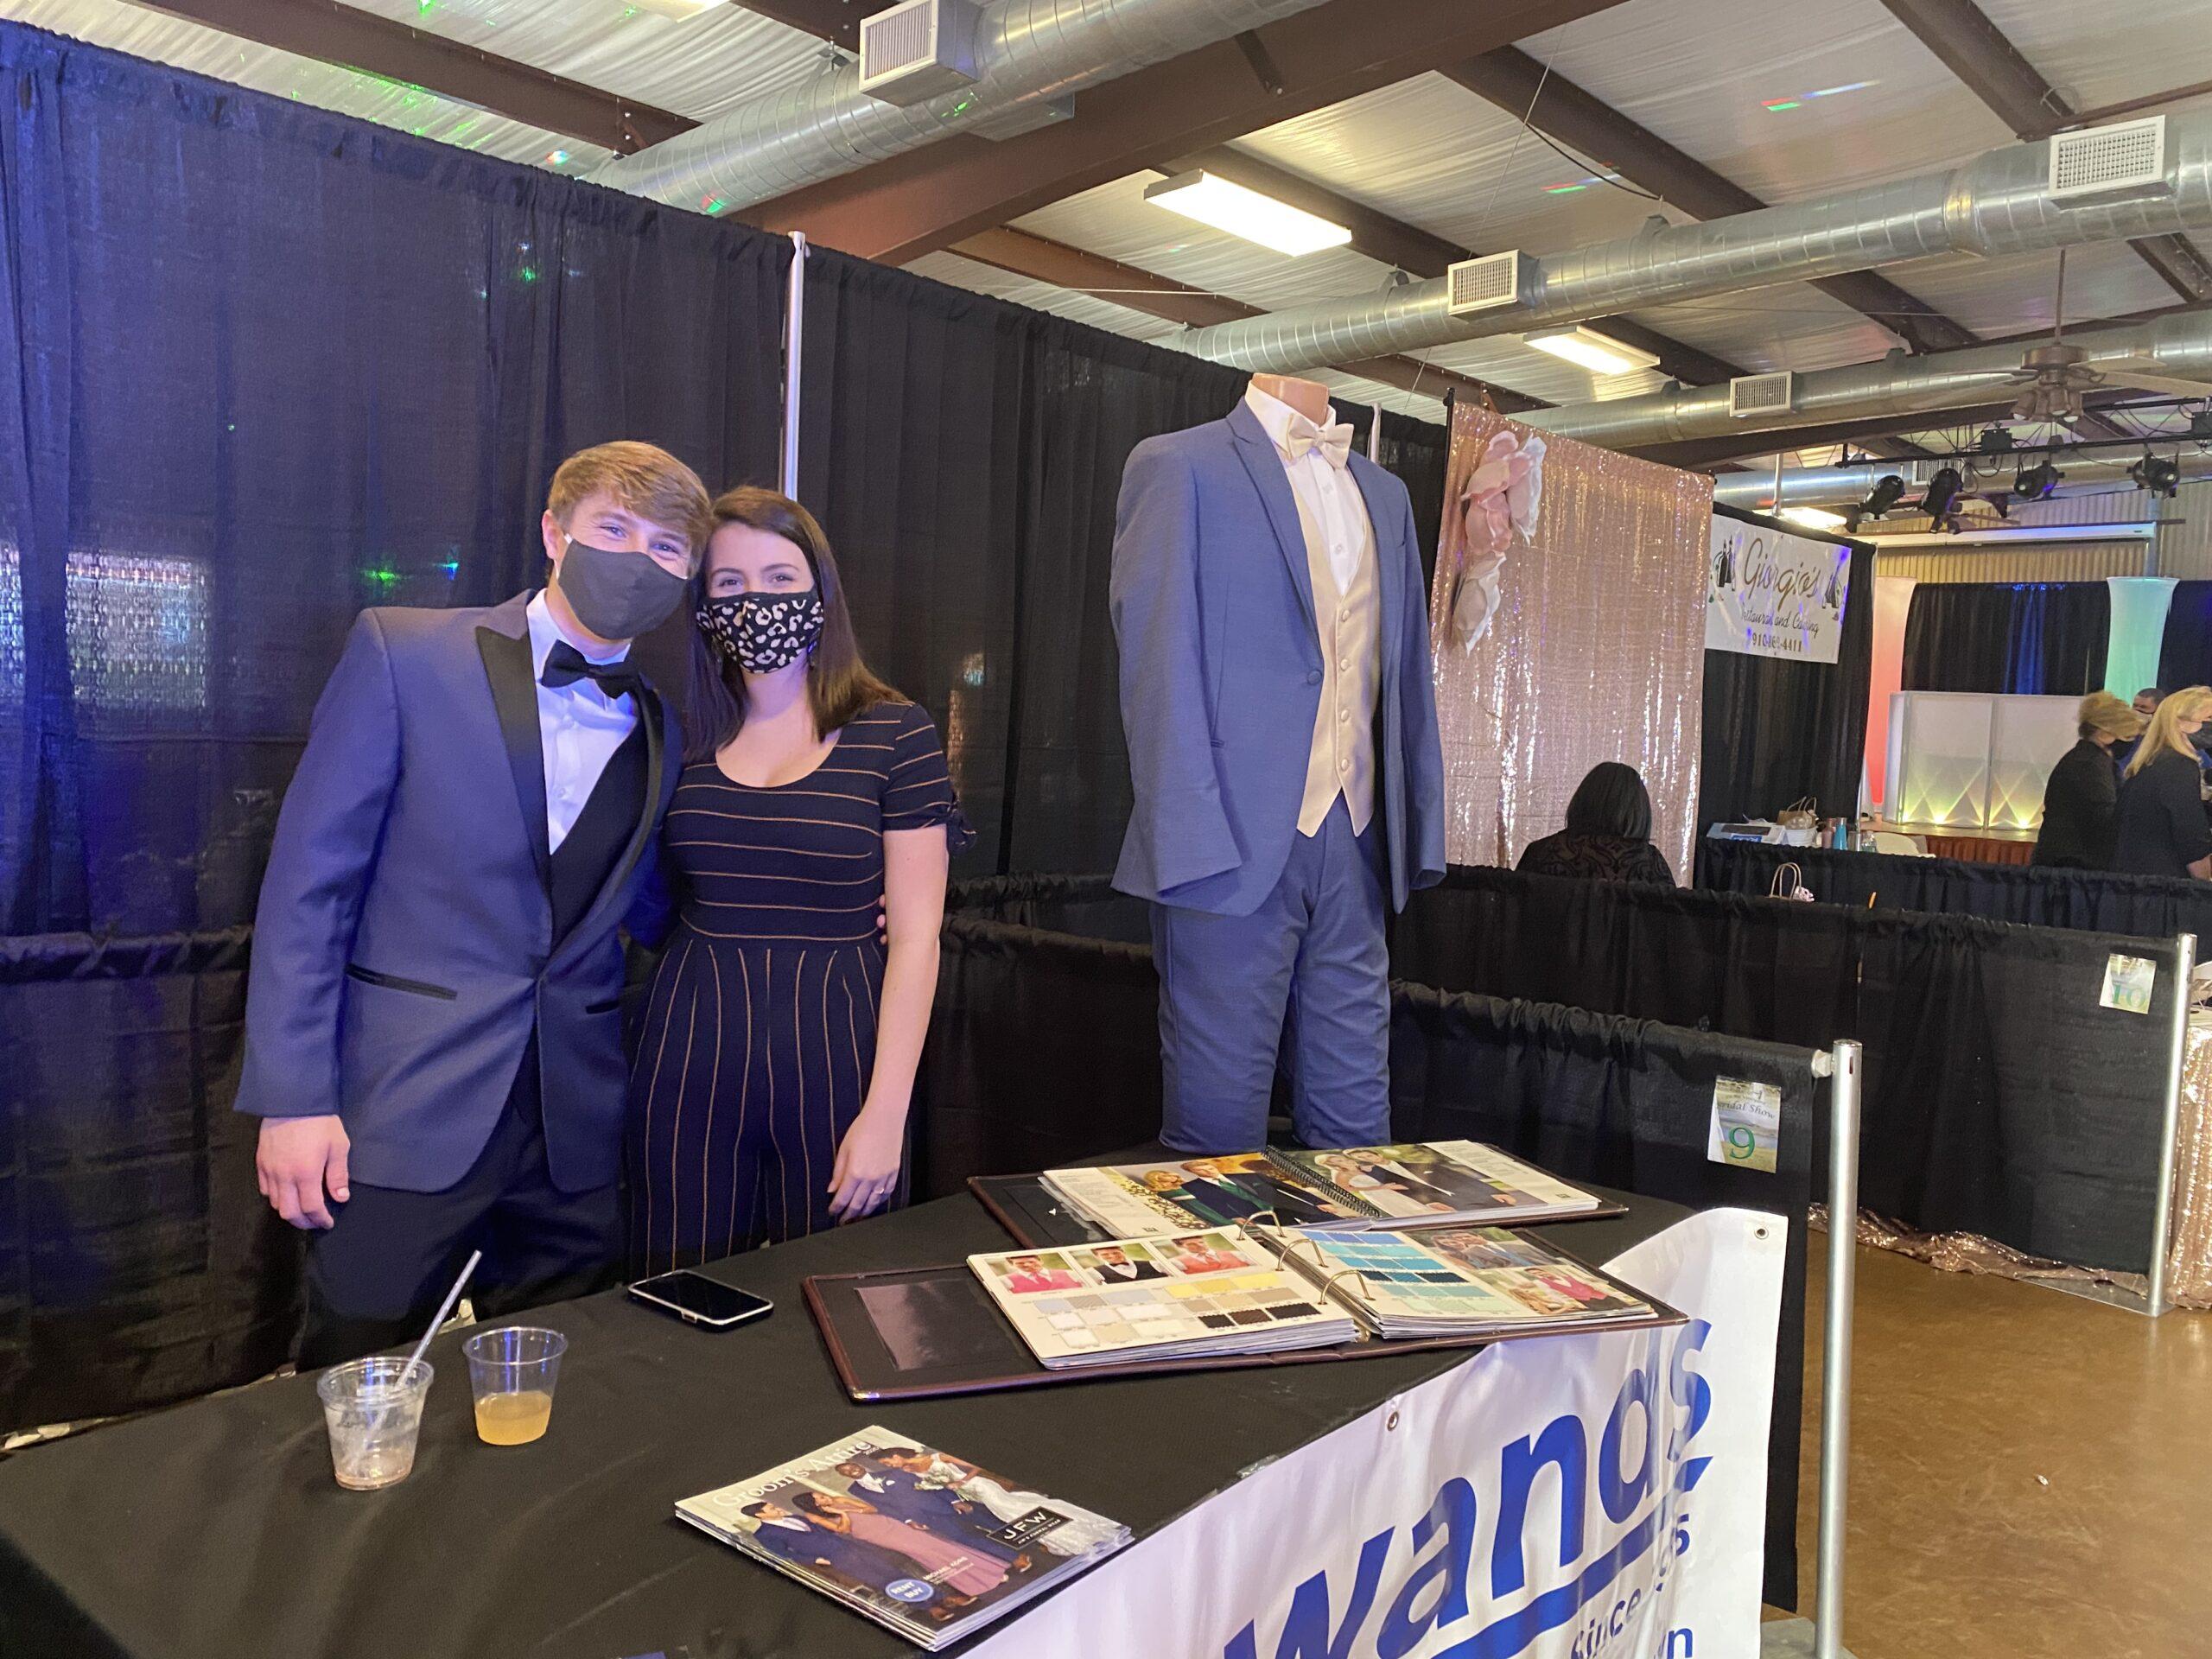 Bridal Show Success amid COVID-19 Pandemic